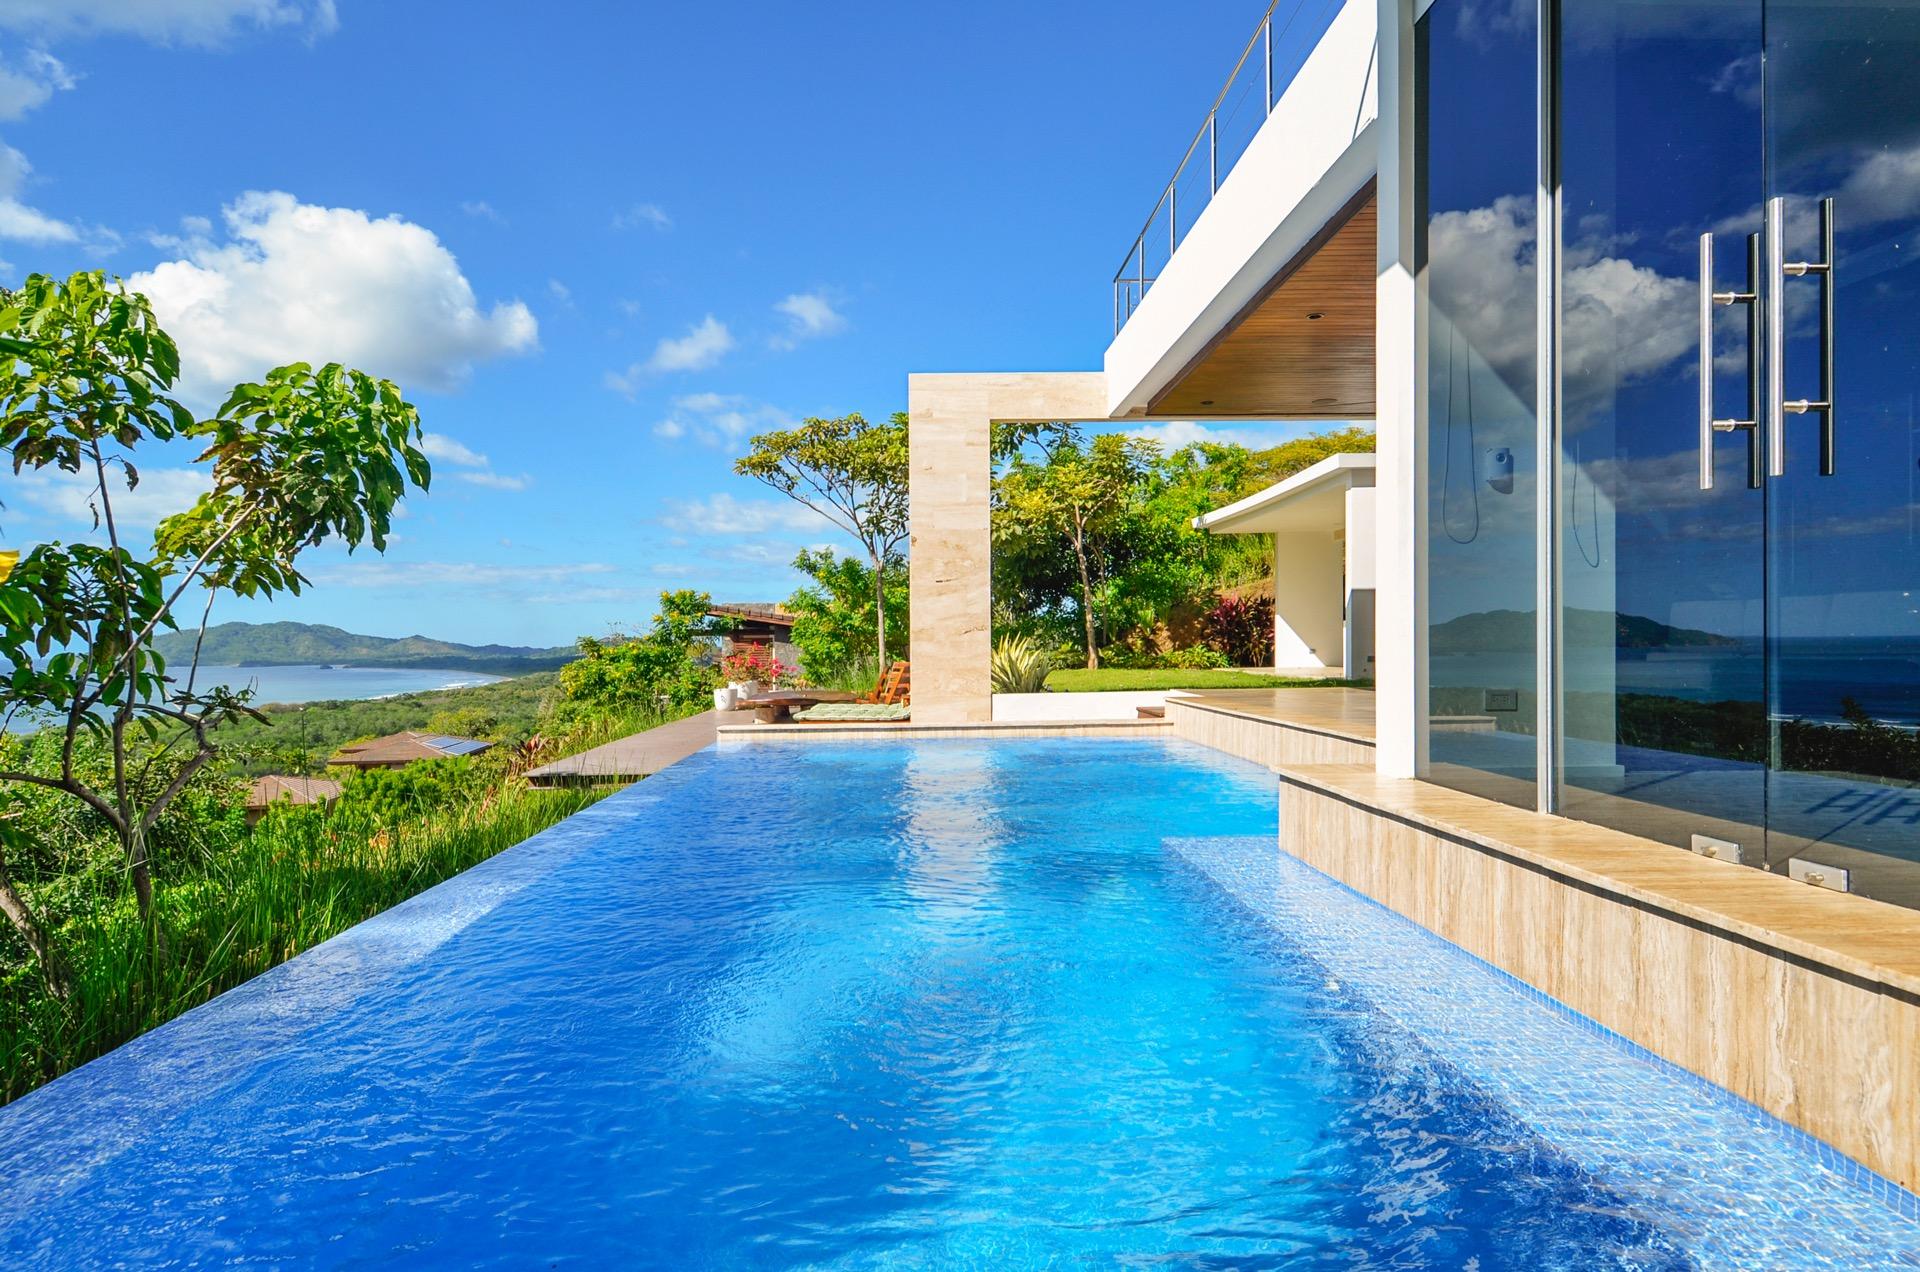 Overlooking Playa Tamarindo and Playa Grande